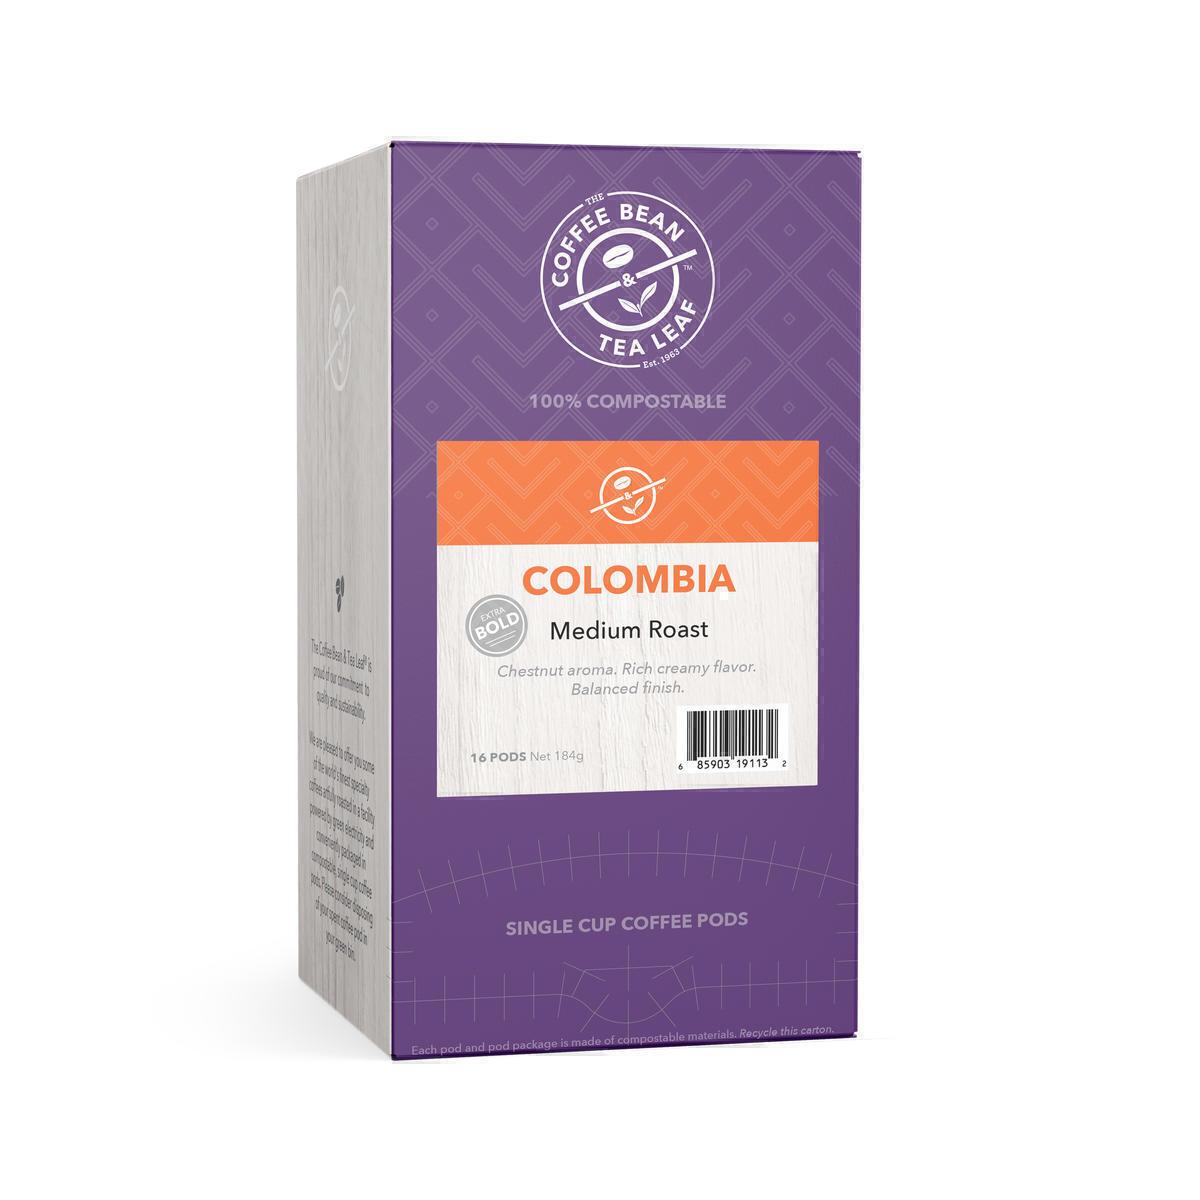 Coffee Bean & Tea Leaf Colombia POD